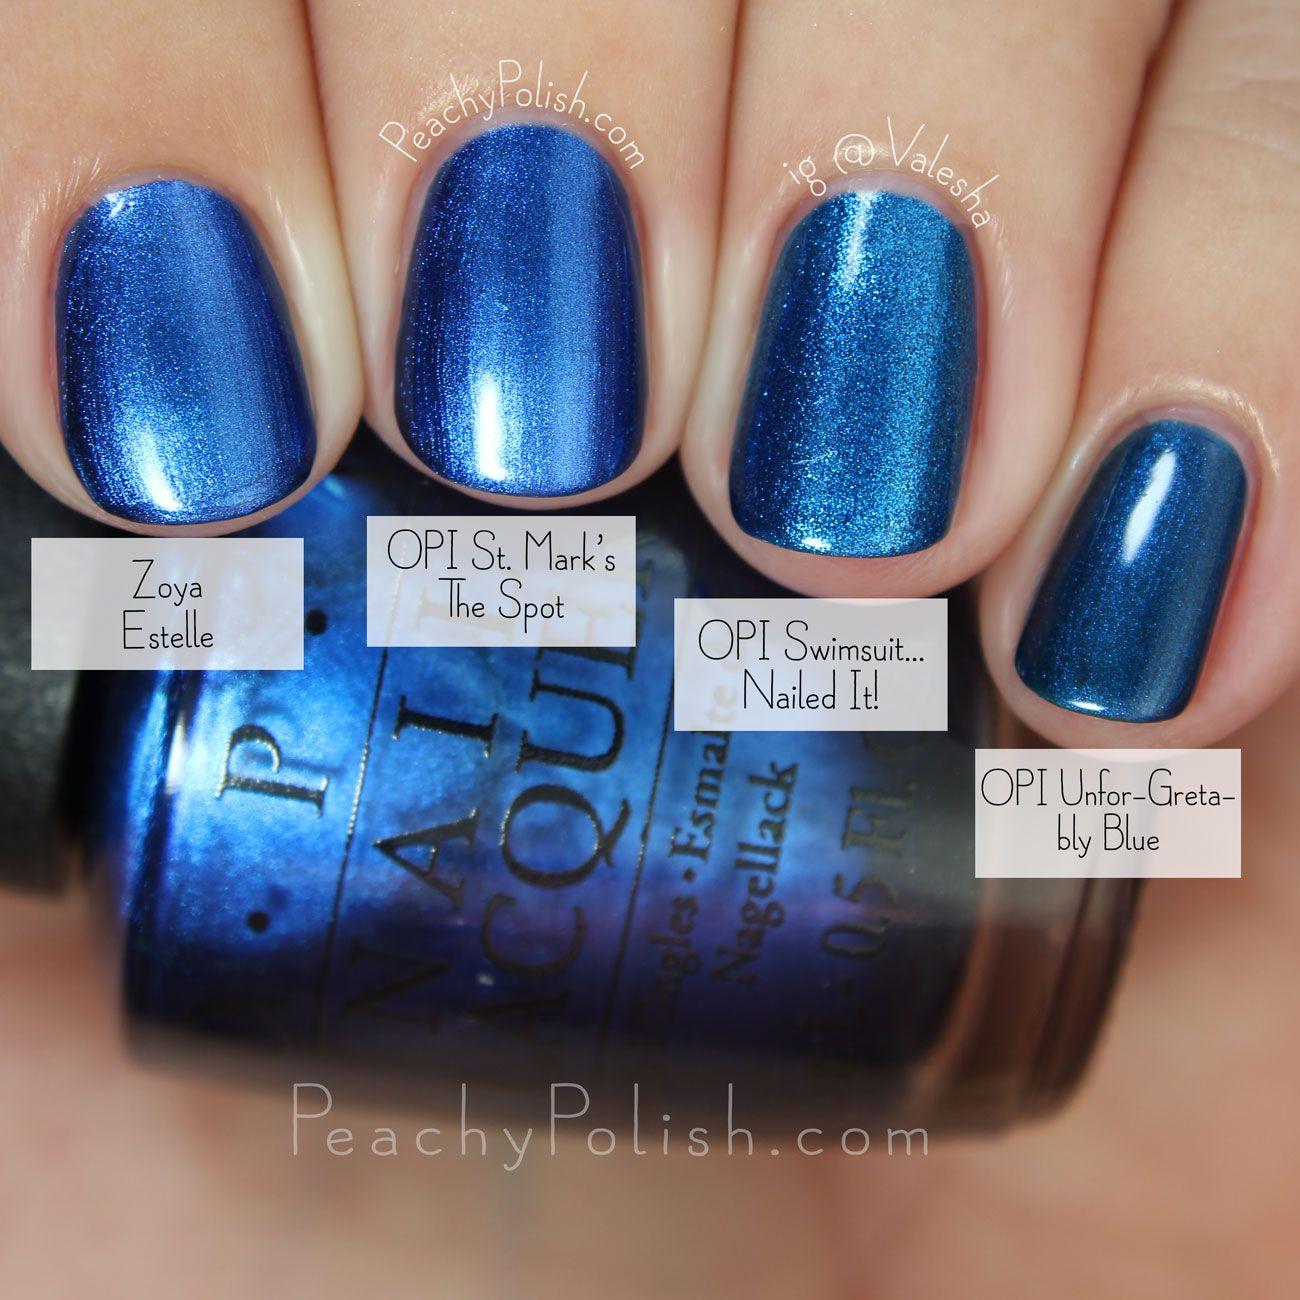 "OPI Venice Collection Comparison: Zoya ""Estelle"", OPI ""St. Mark\'s ..."